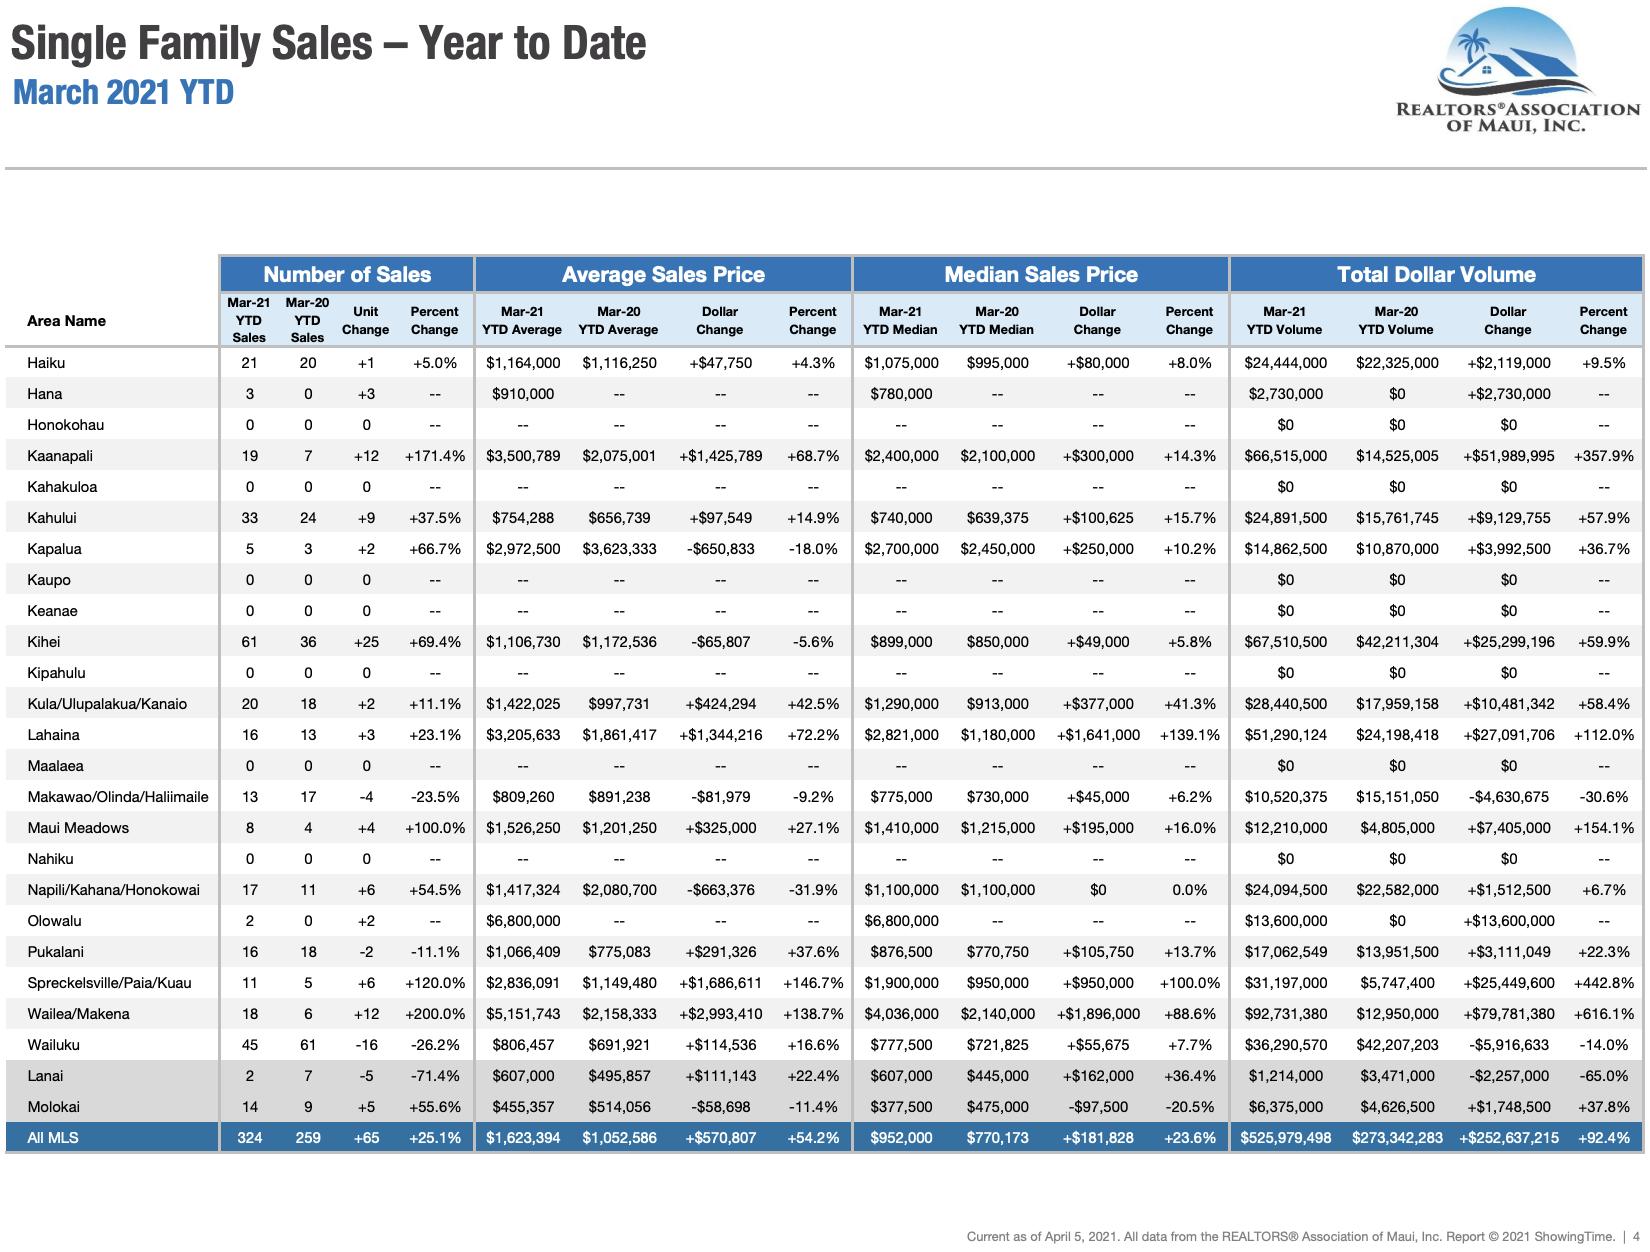 Maui Hawaii single family home sale statistics through March 2020.